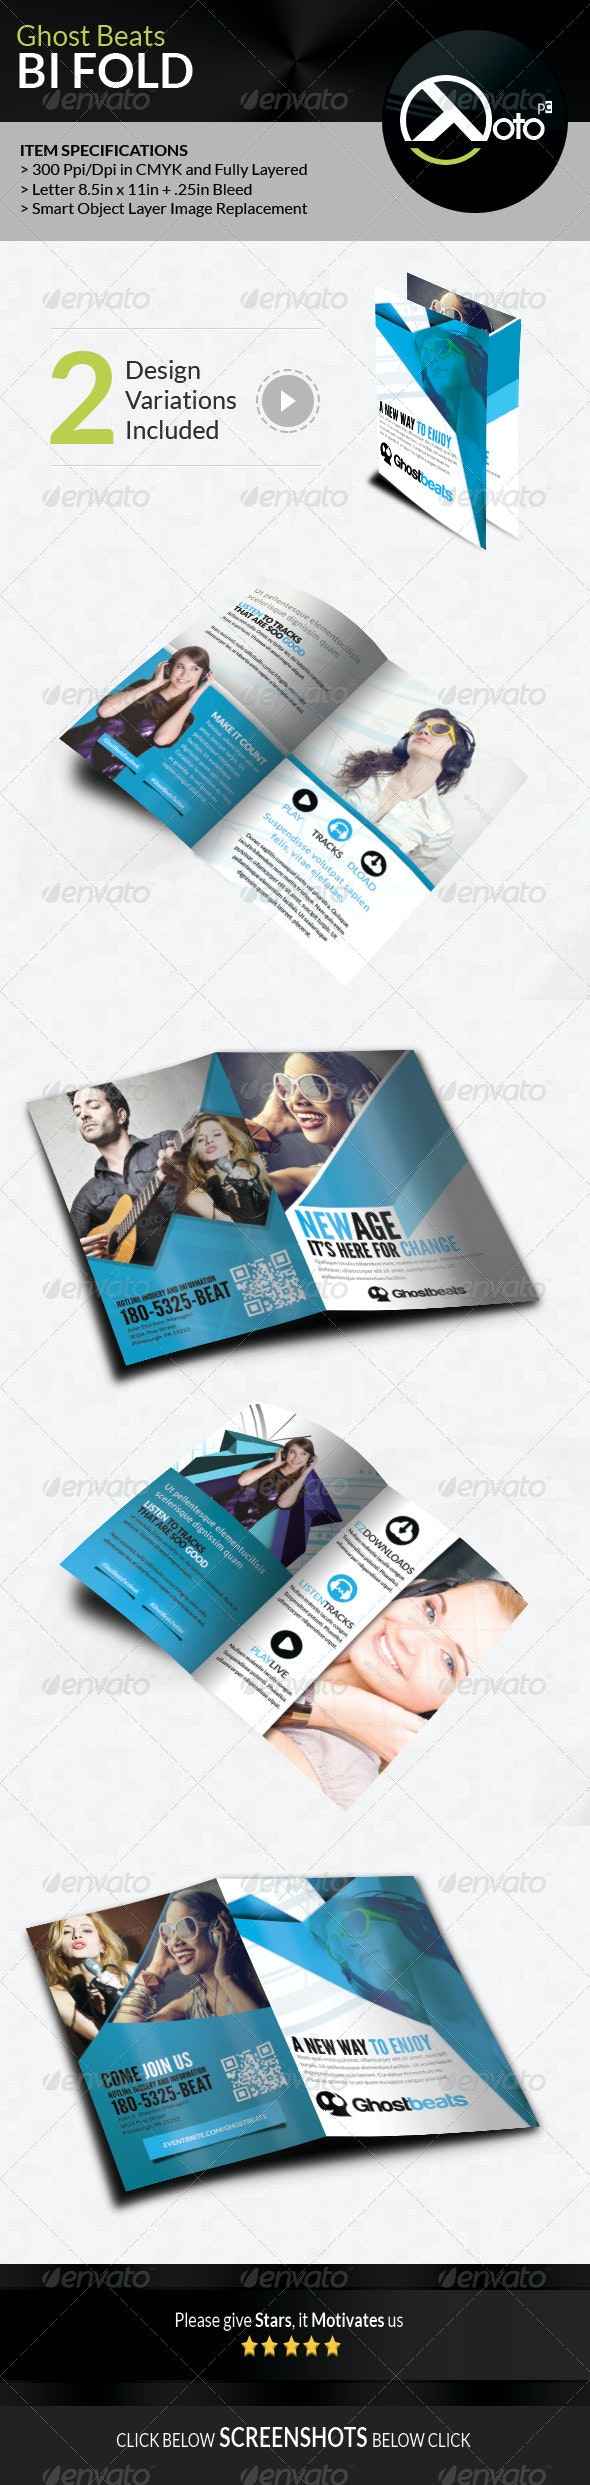 Ghost Beats Music Downloads BiFold - Brochures Print Templates